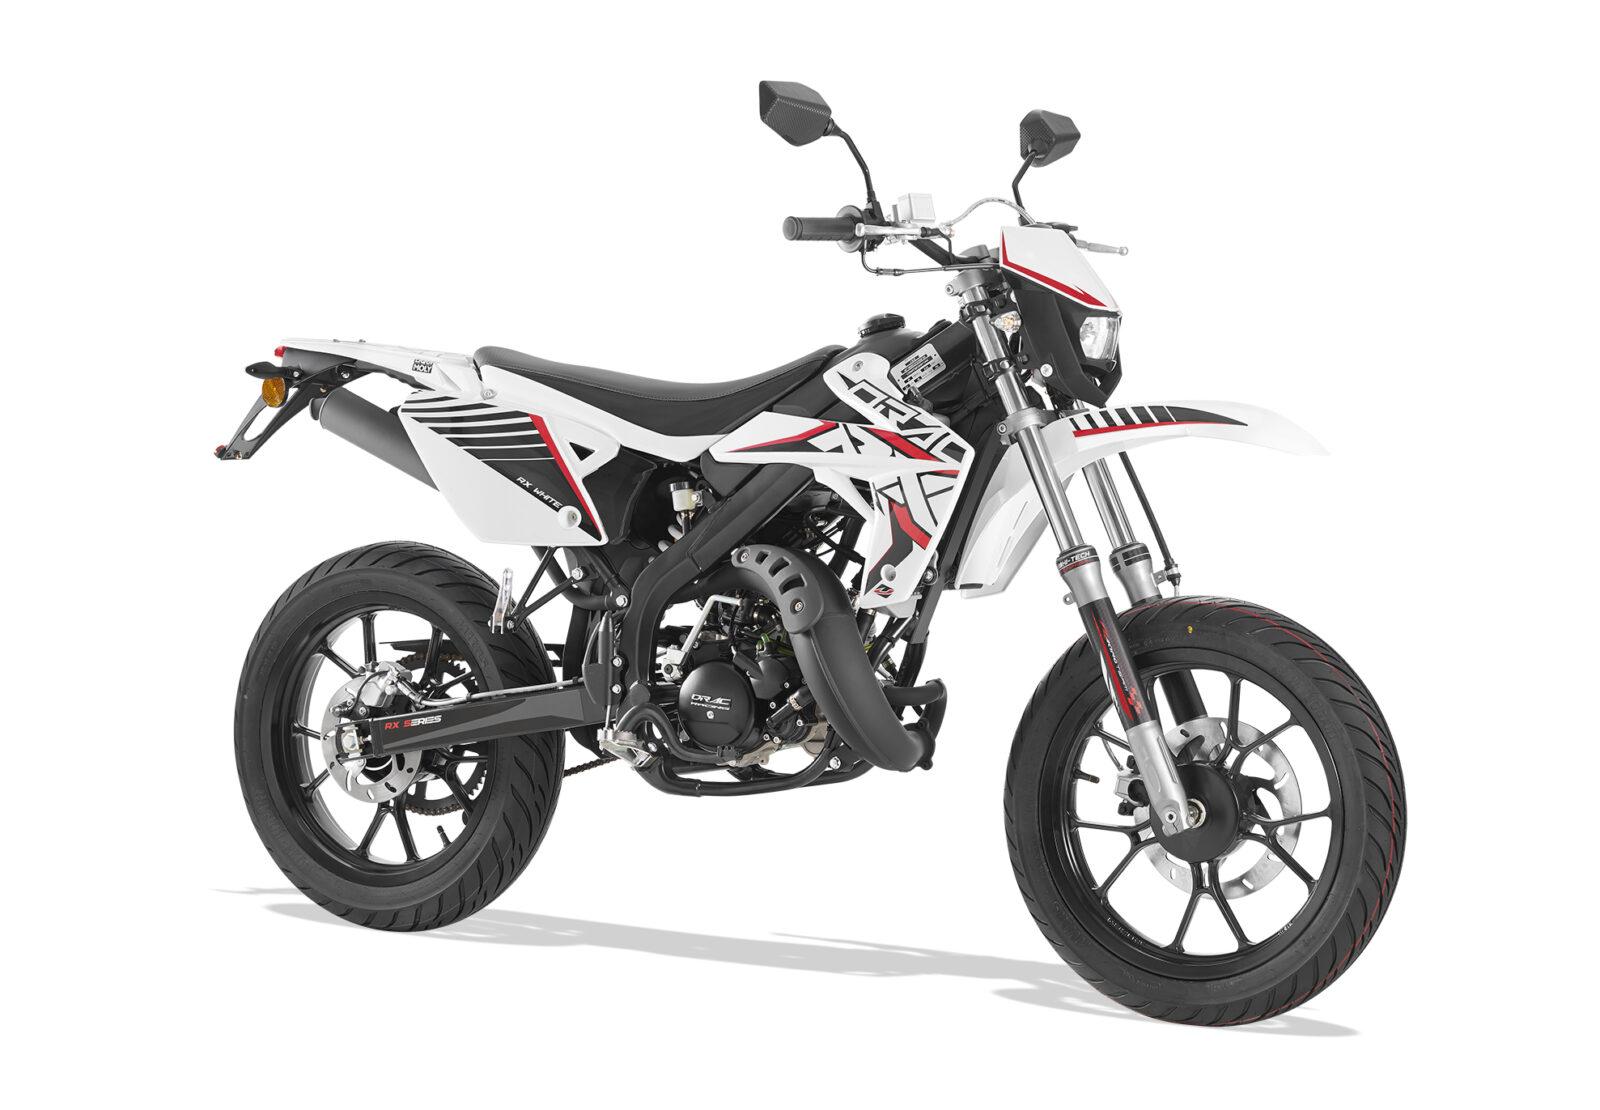 SM RX white